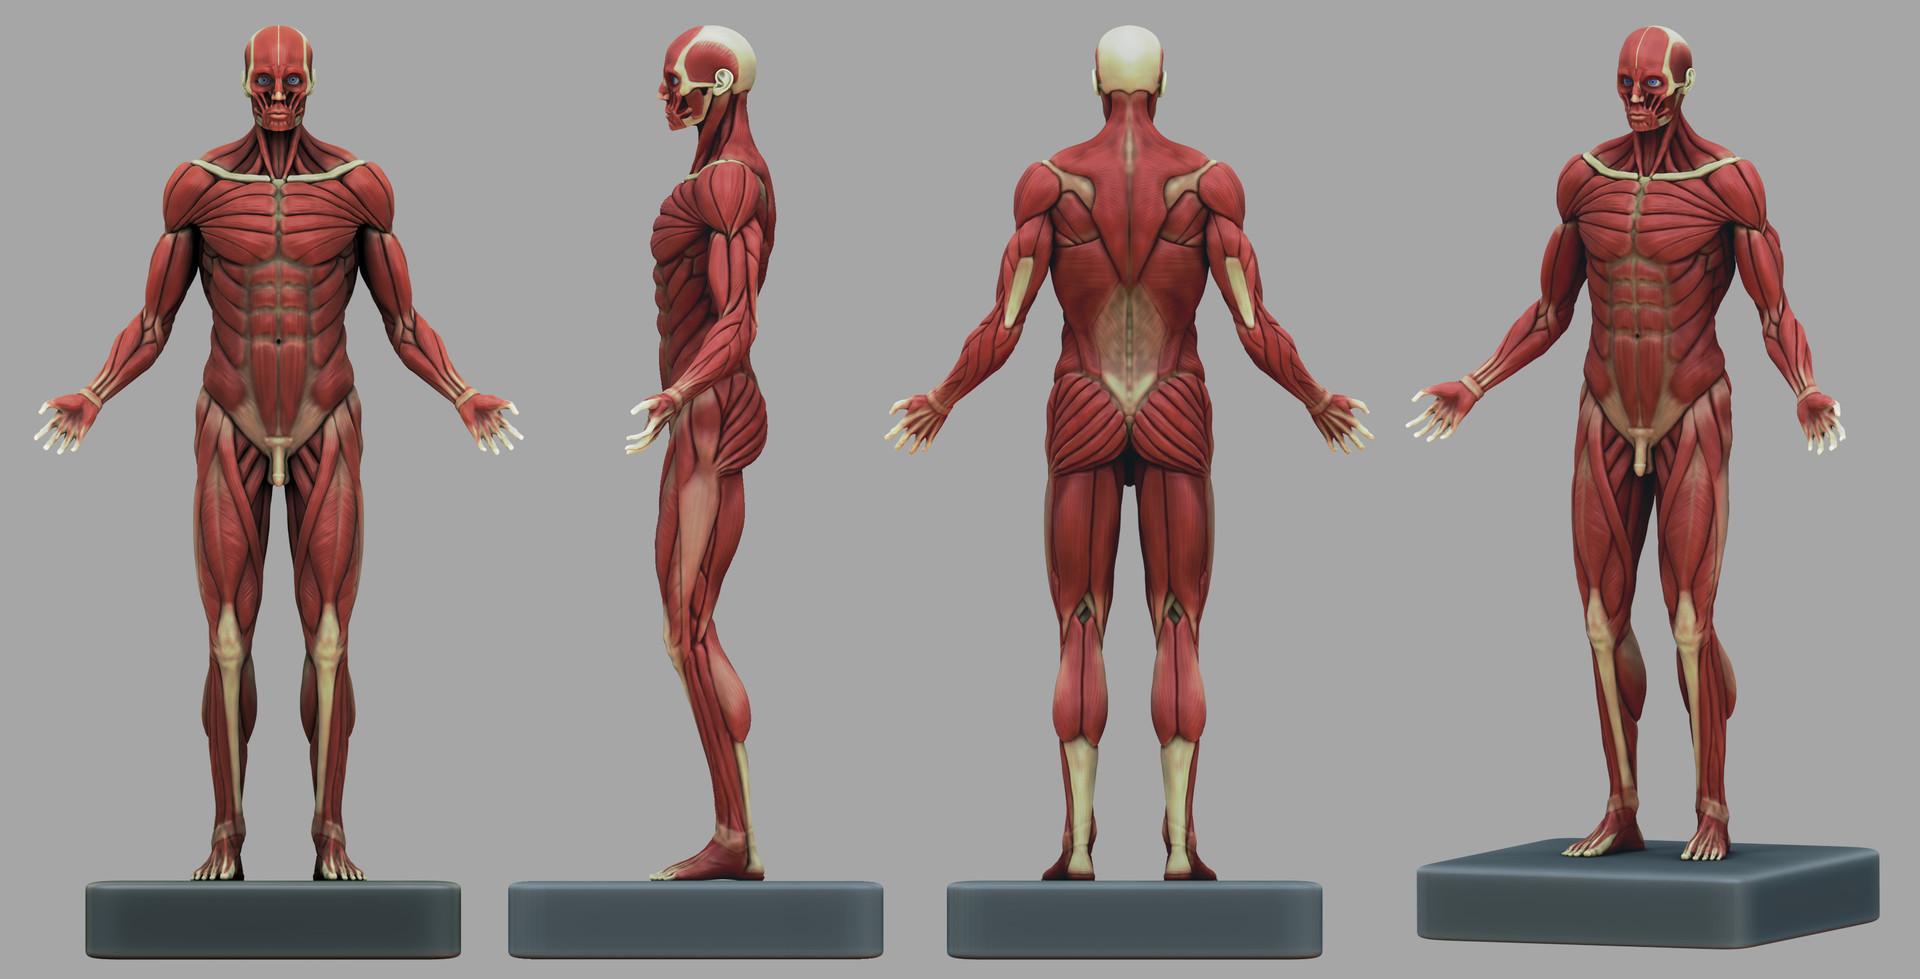 ayrwann-mary-mary-ayrwann-zbrush-anatomy